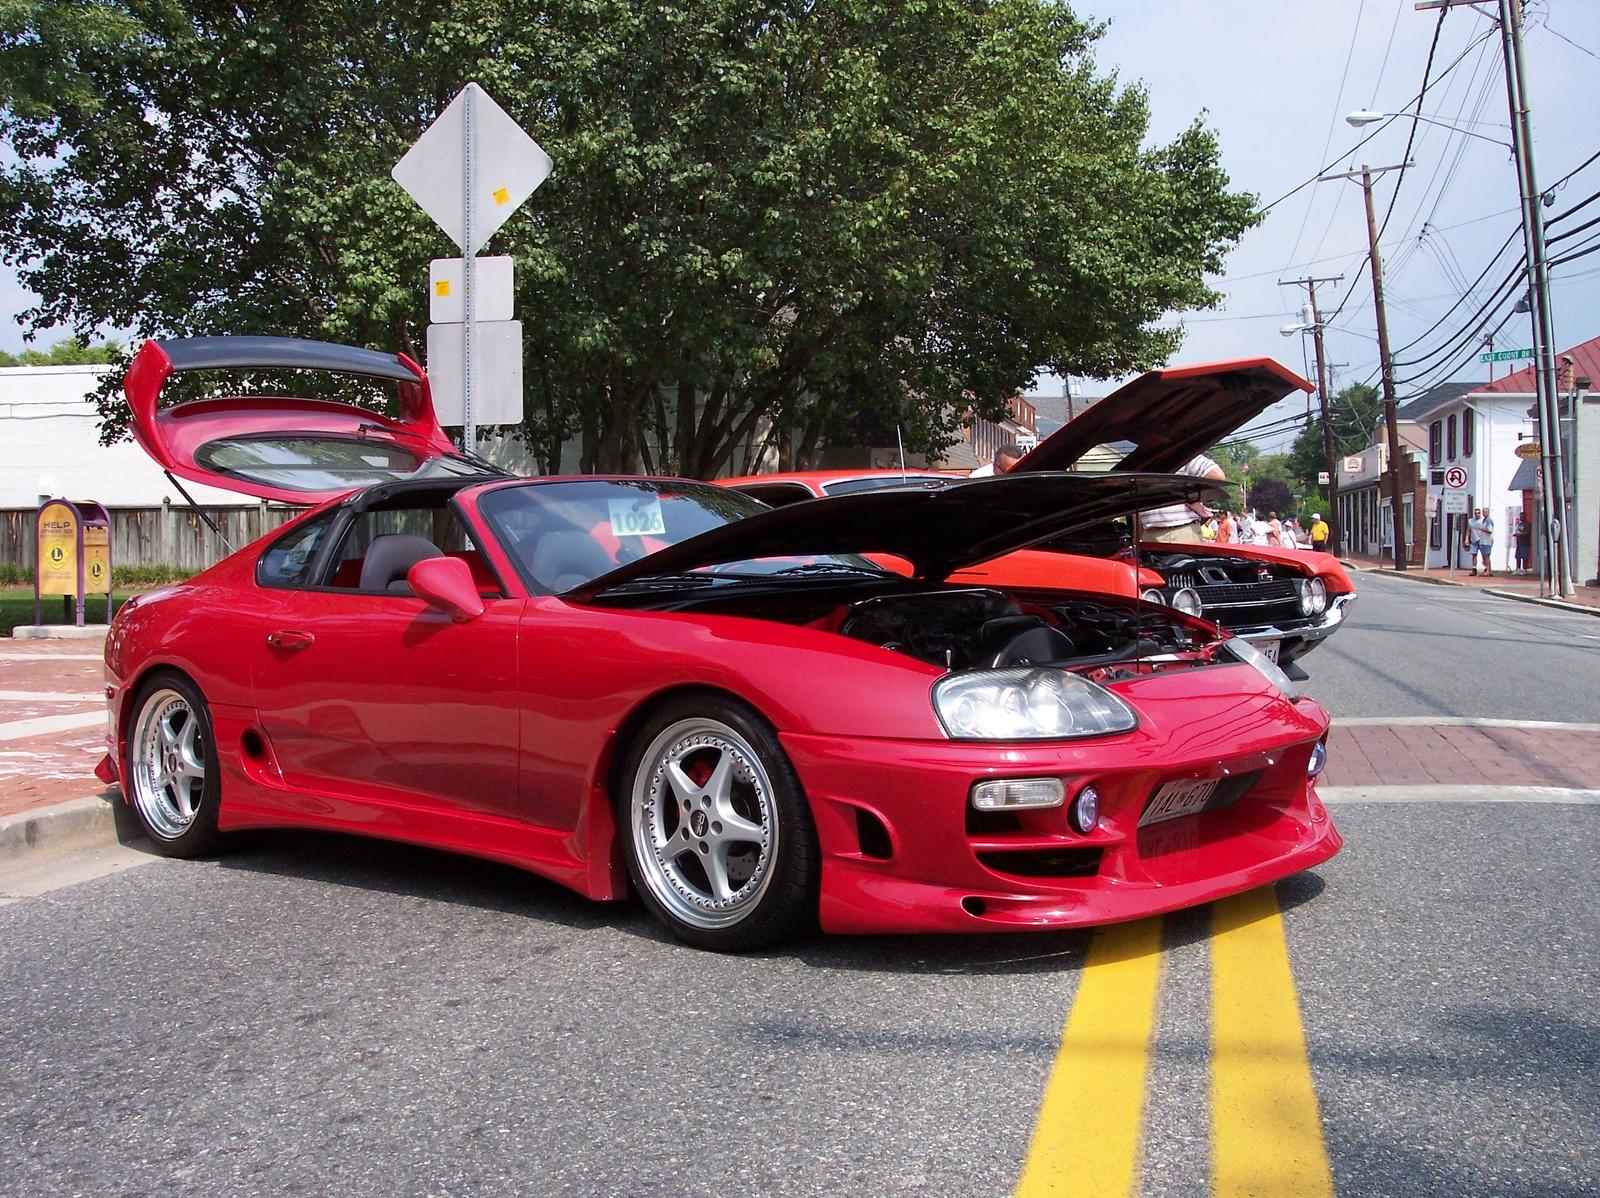 1993 Toyota Supra - Overview